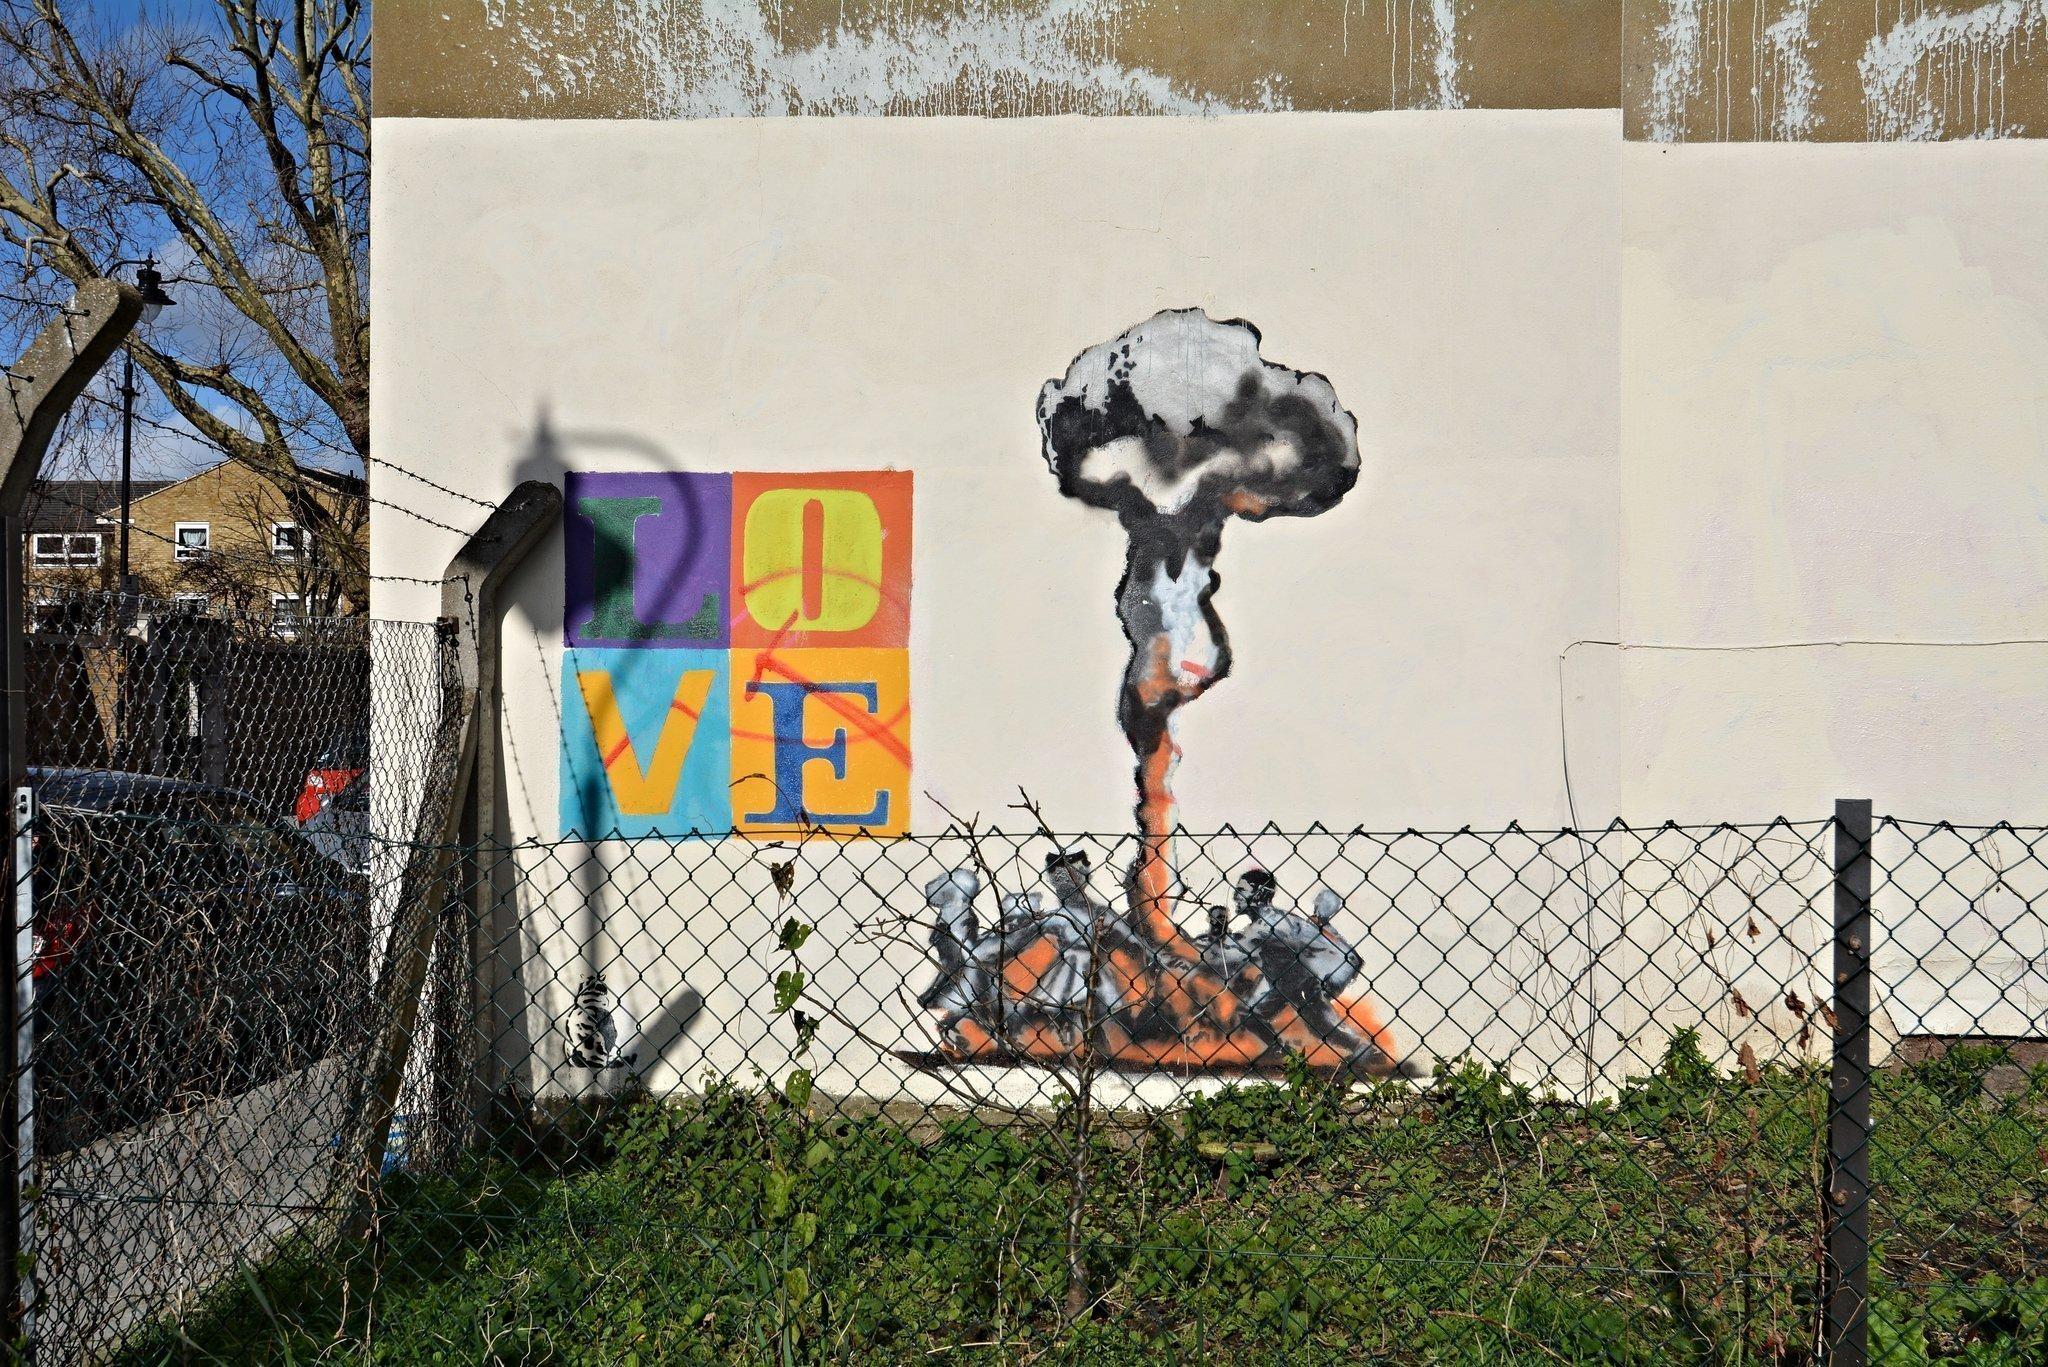 mandela way london street art graffiti stompie stompy tank t34